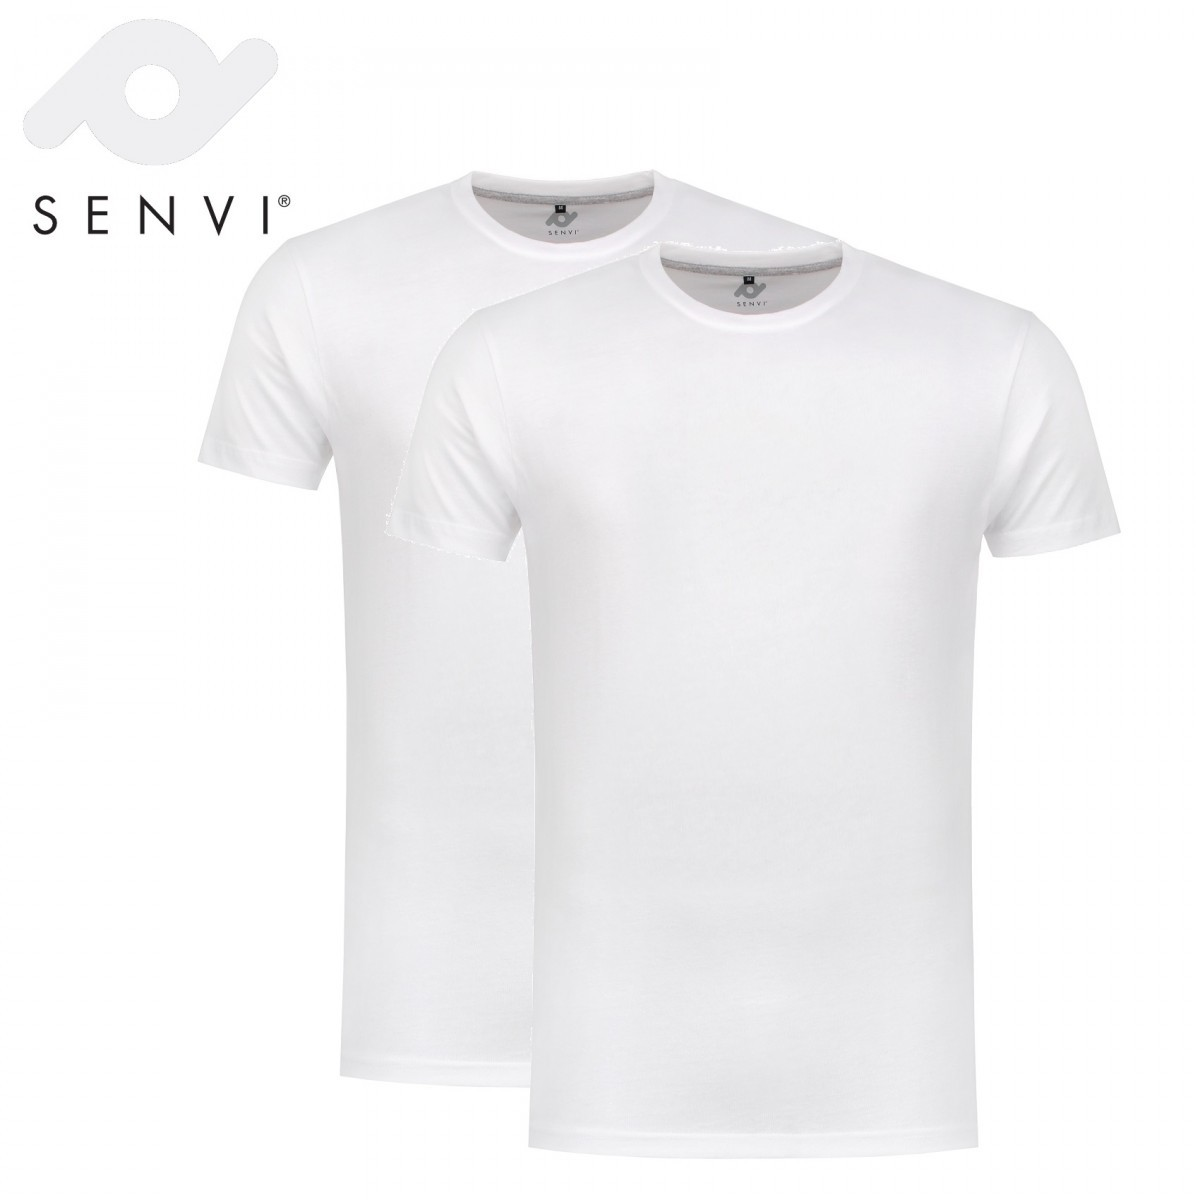 Senvi Basic T-Shirt Wit 2 Pack Maat XXXL (3XL)